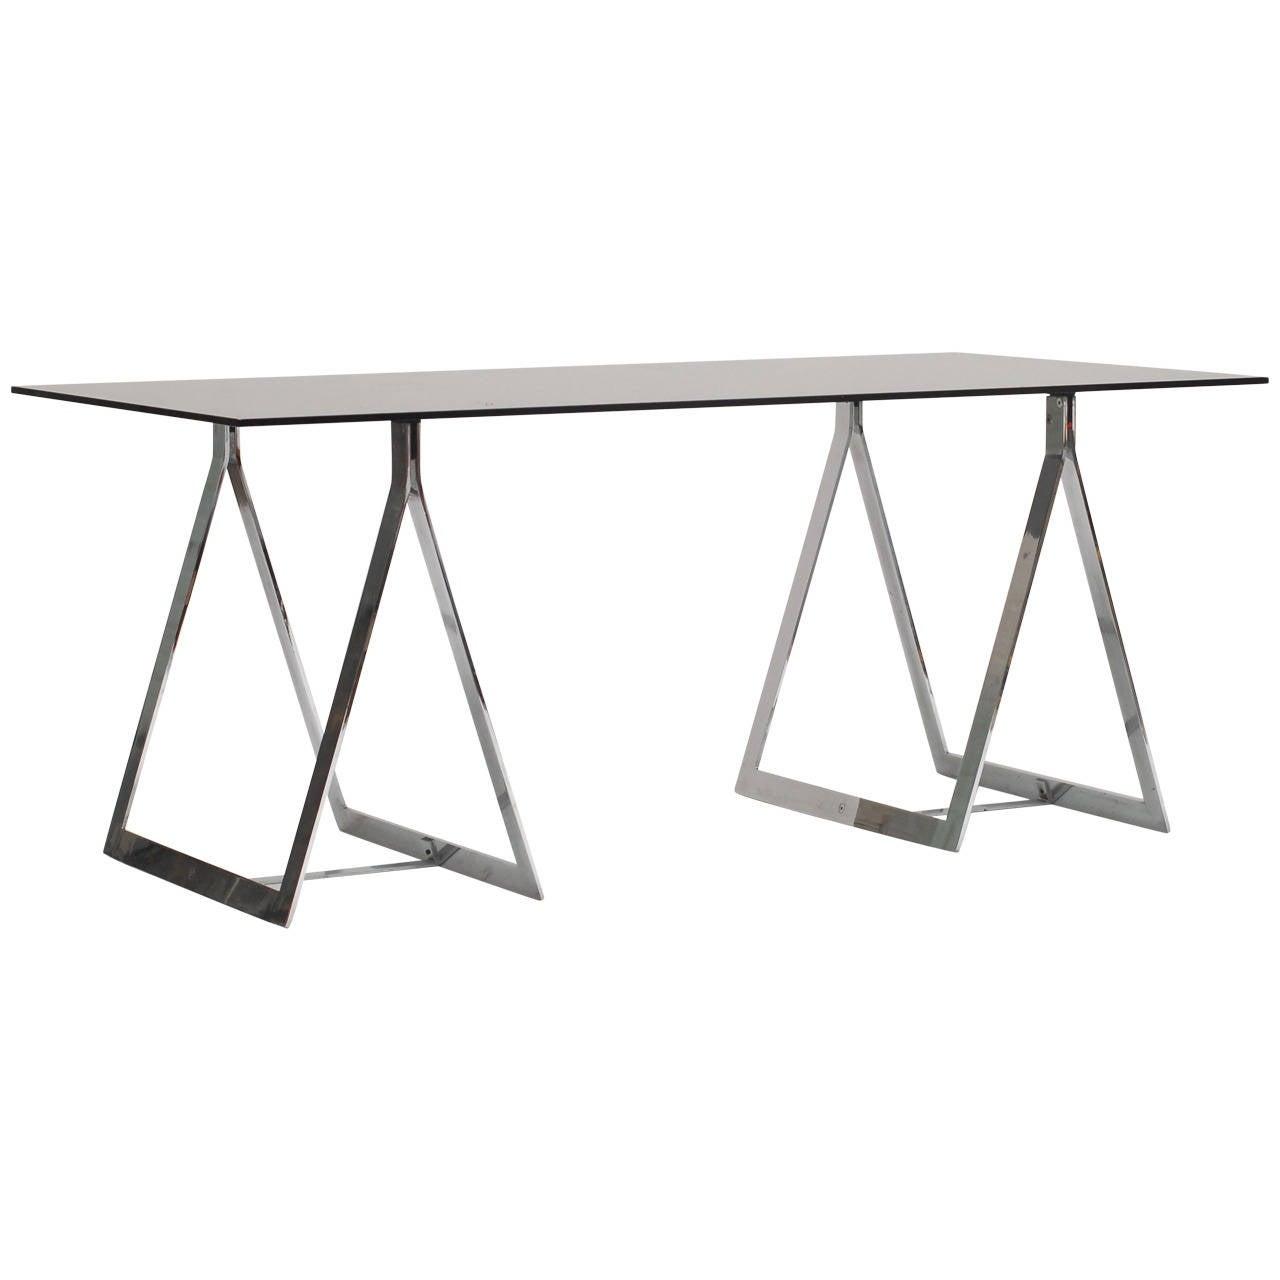 1960's Belgian Atelier sawhorse desk table 1